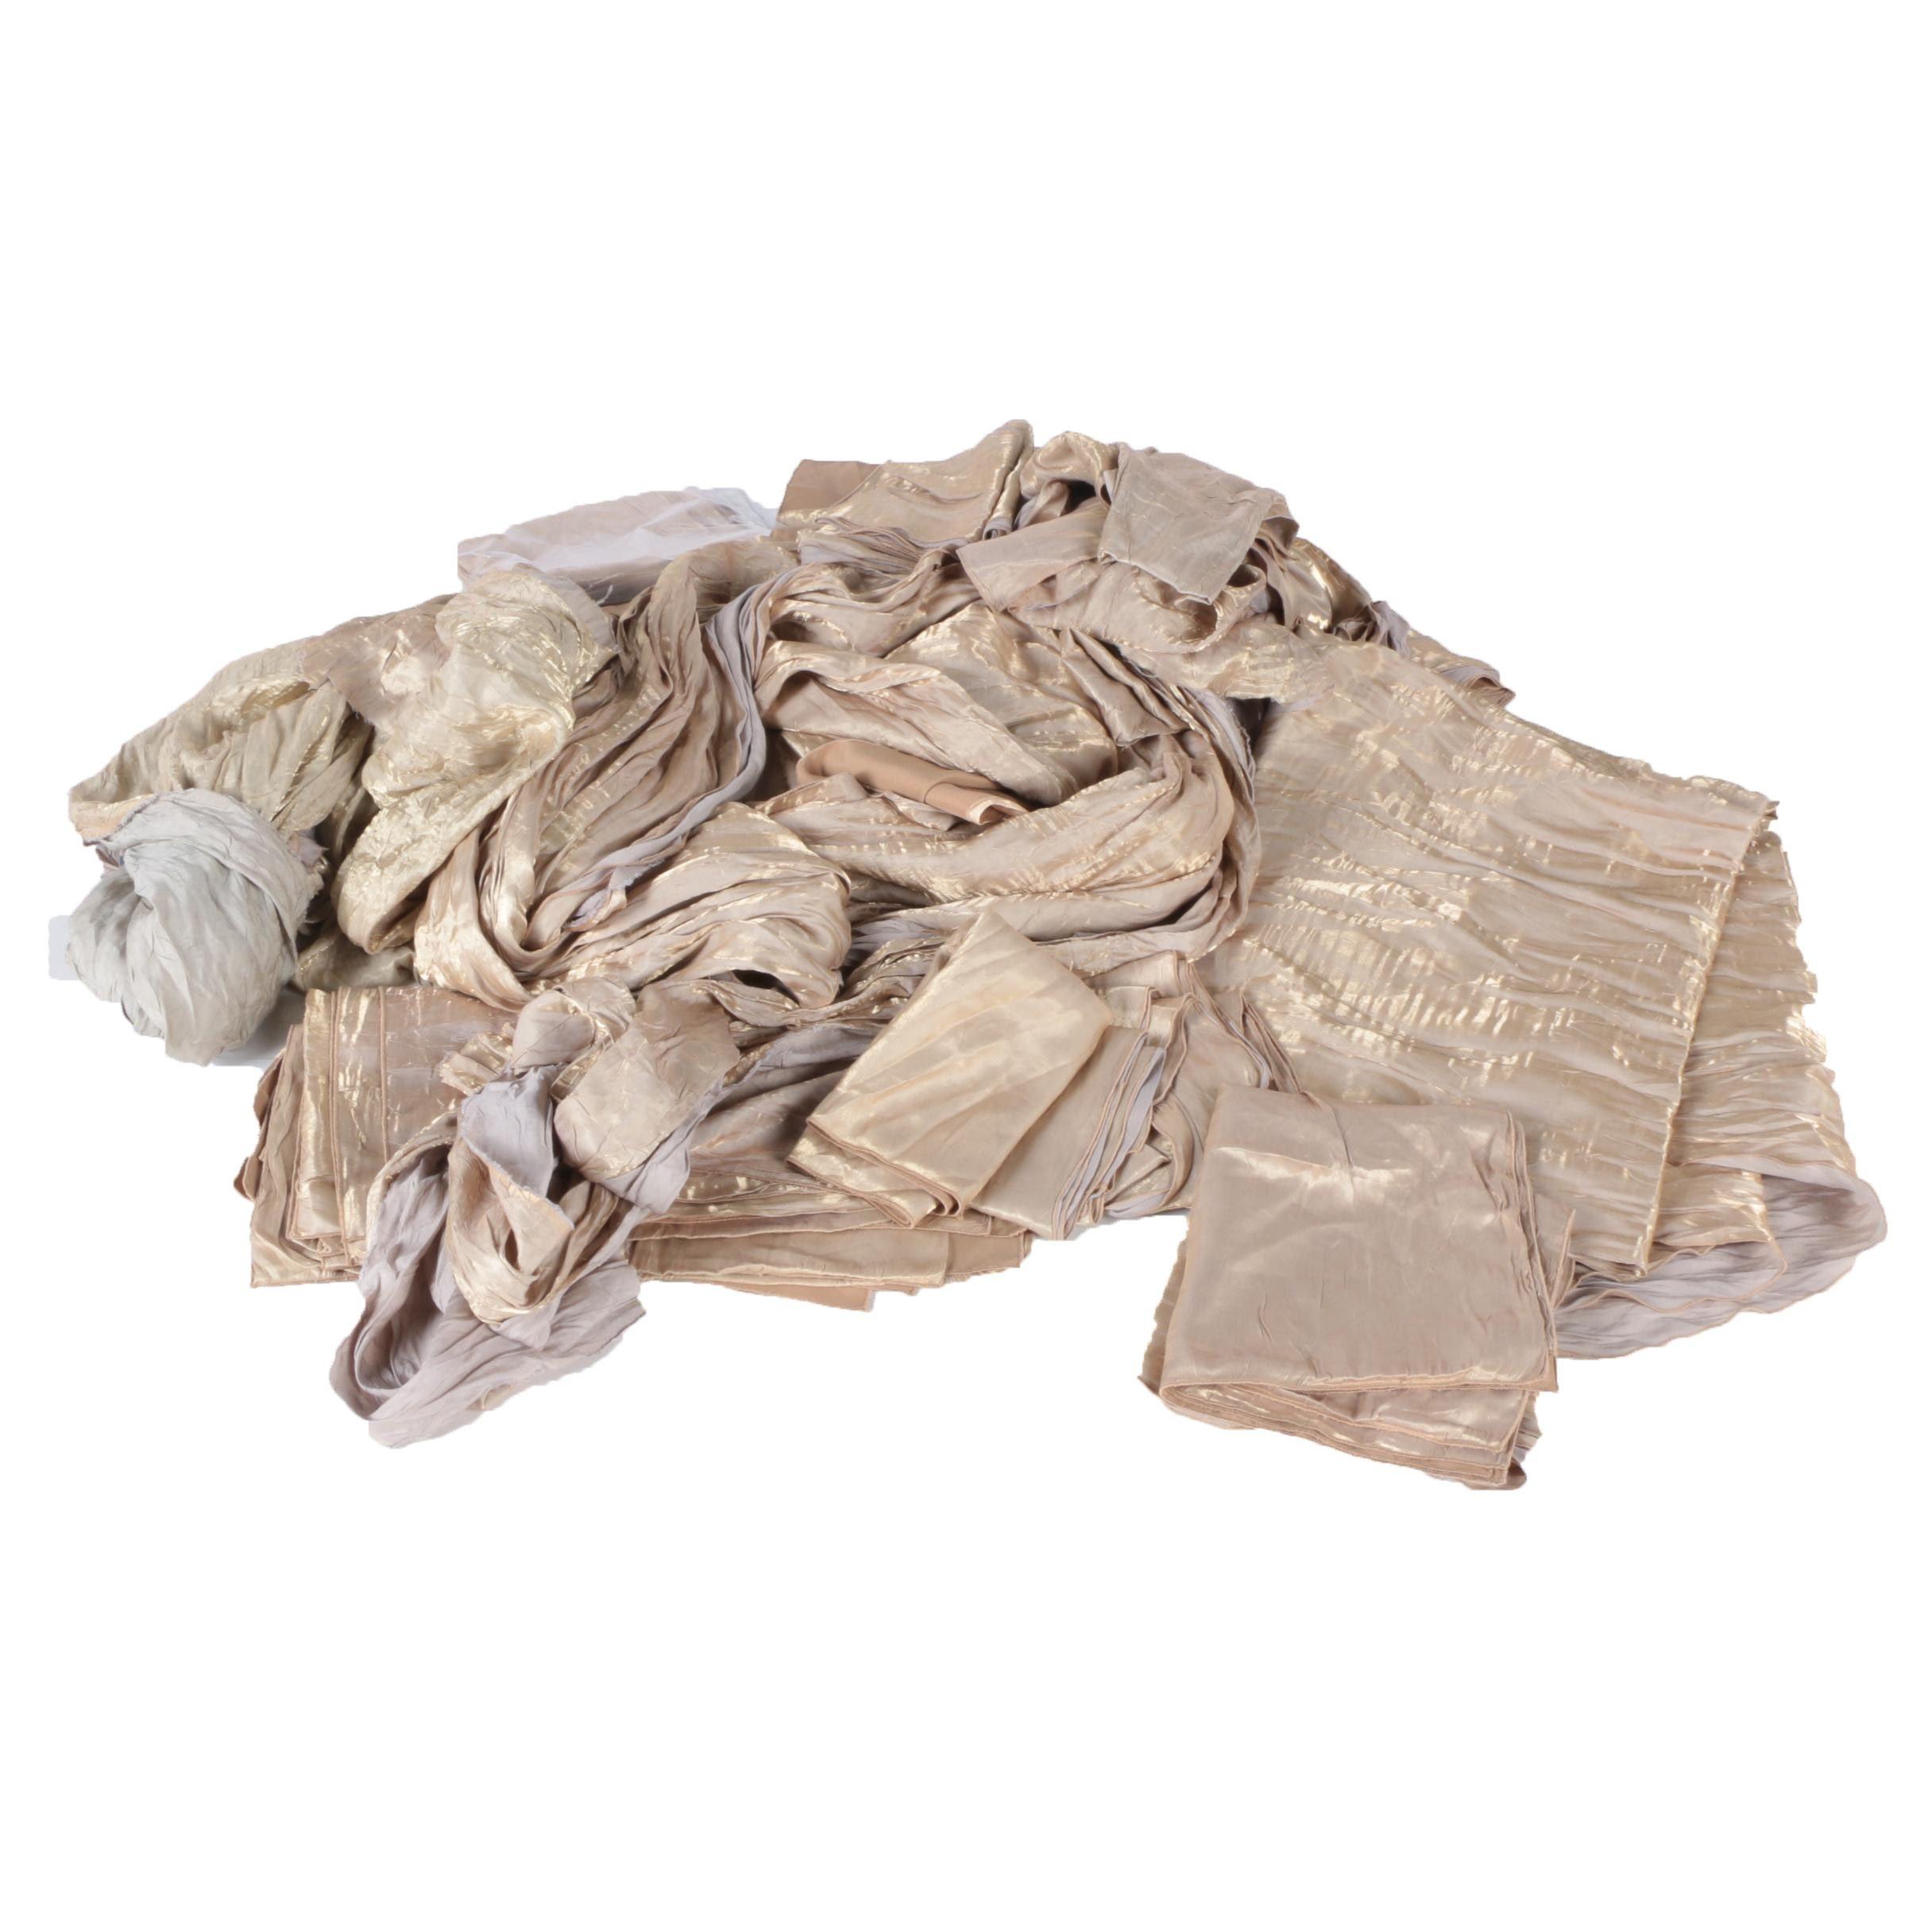 Assortment of Gold-Toned Tablecloths & Napkins